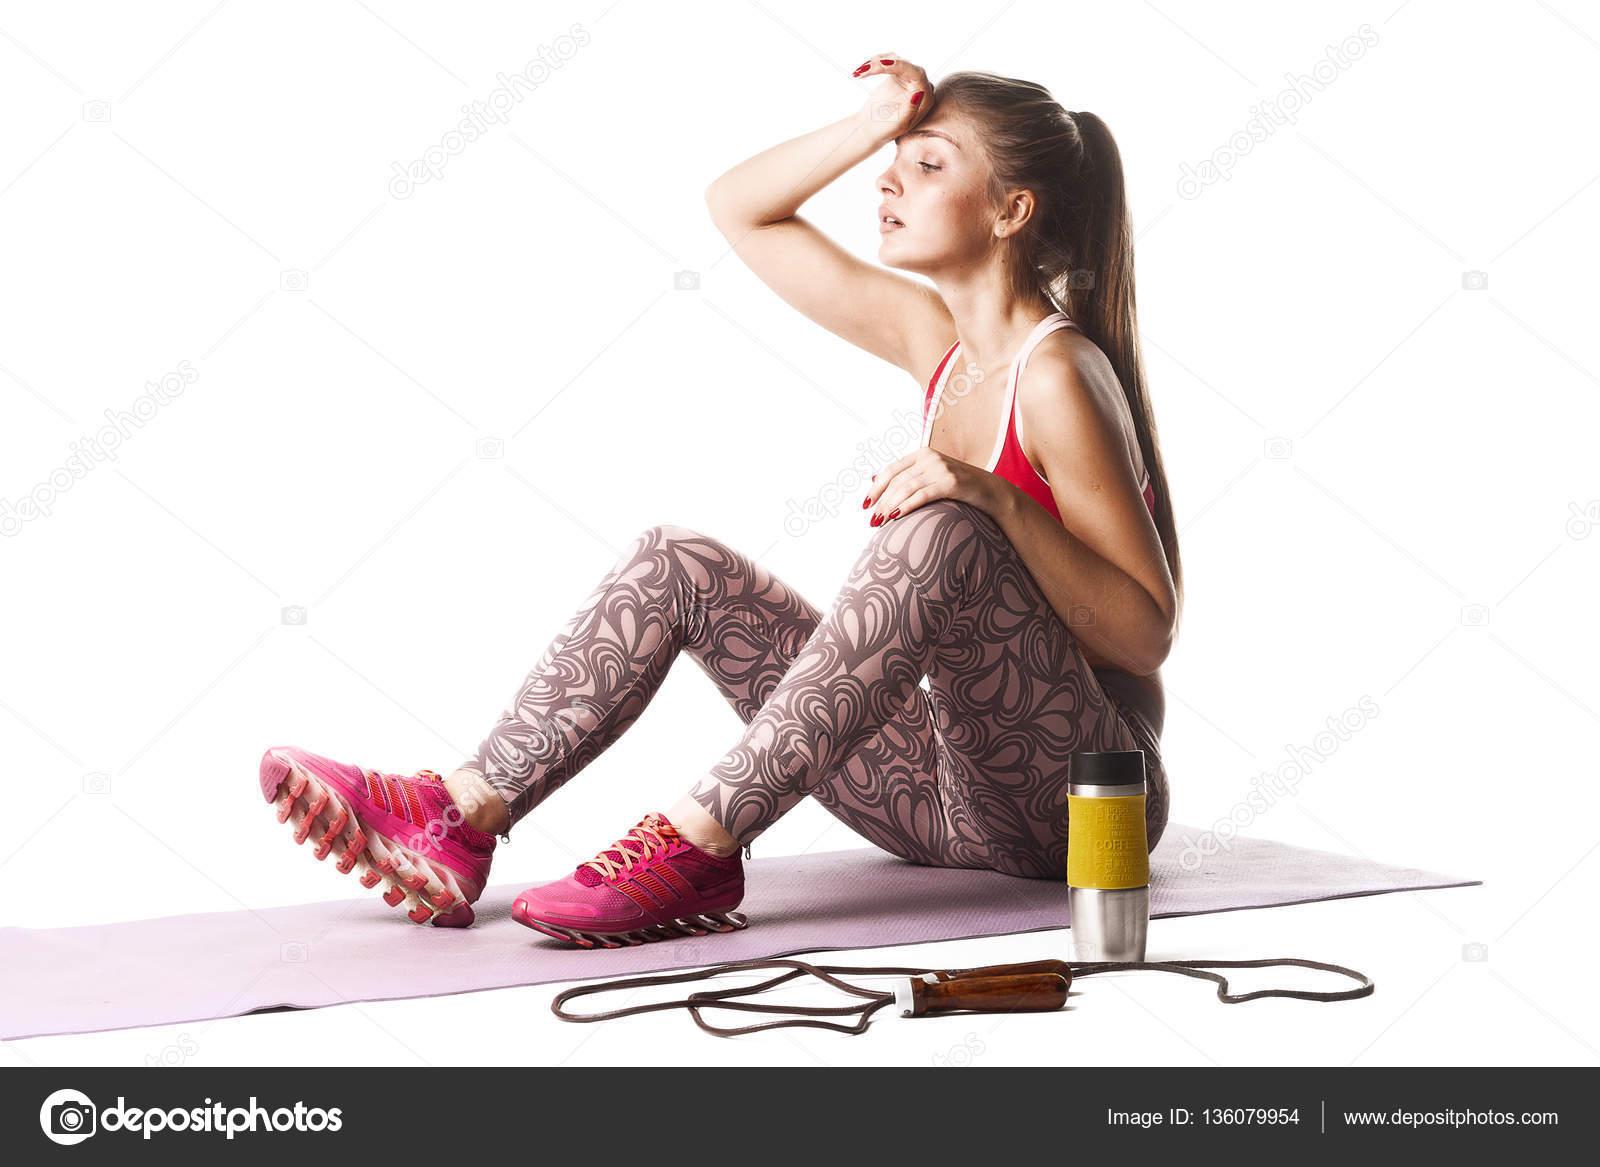 krásne nahé fitness modely